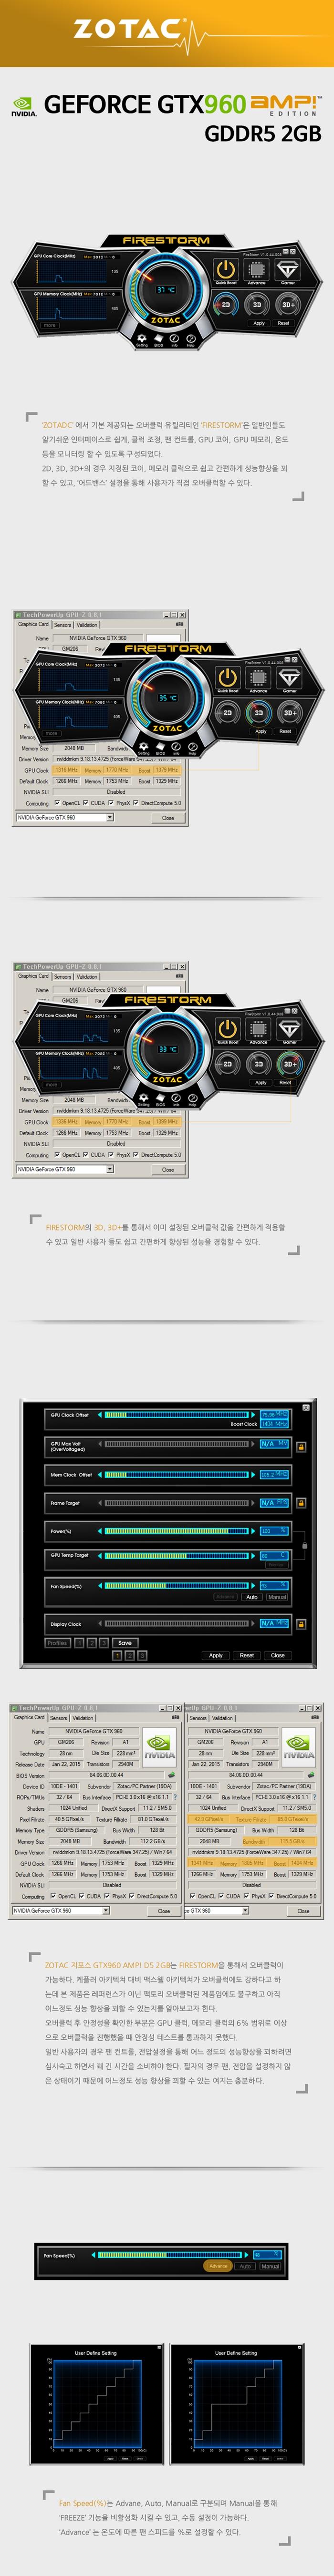 GTX960오버클럭 조텍 지포스 GTX960 AMP! 아이스스톰 D5 2GB.jpg